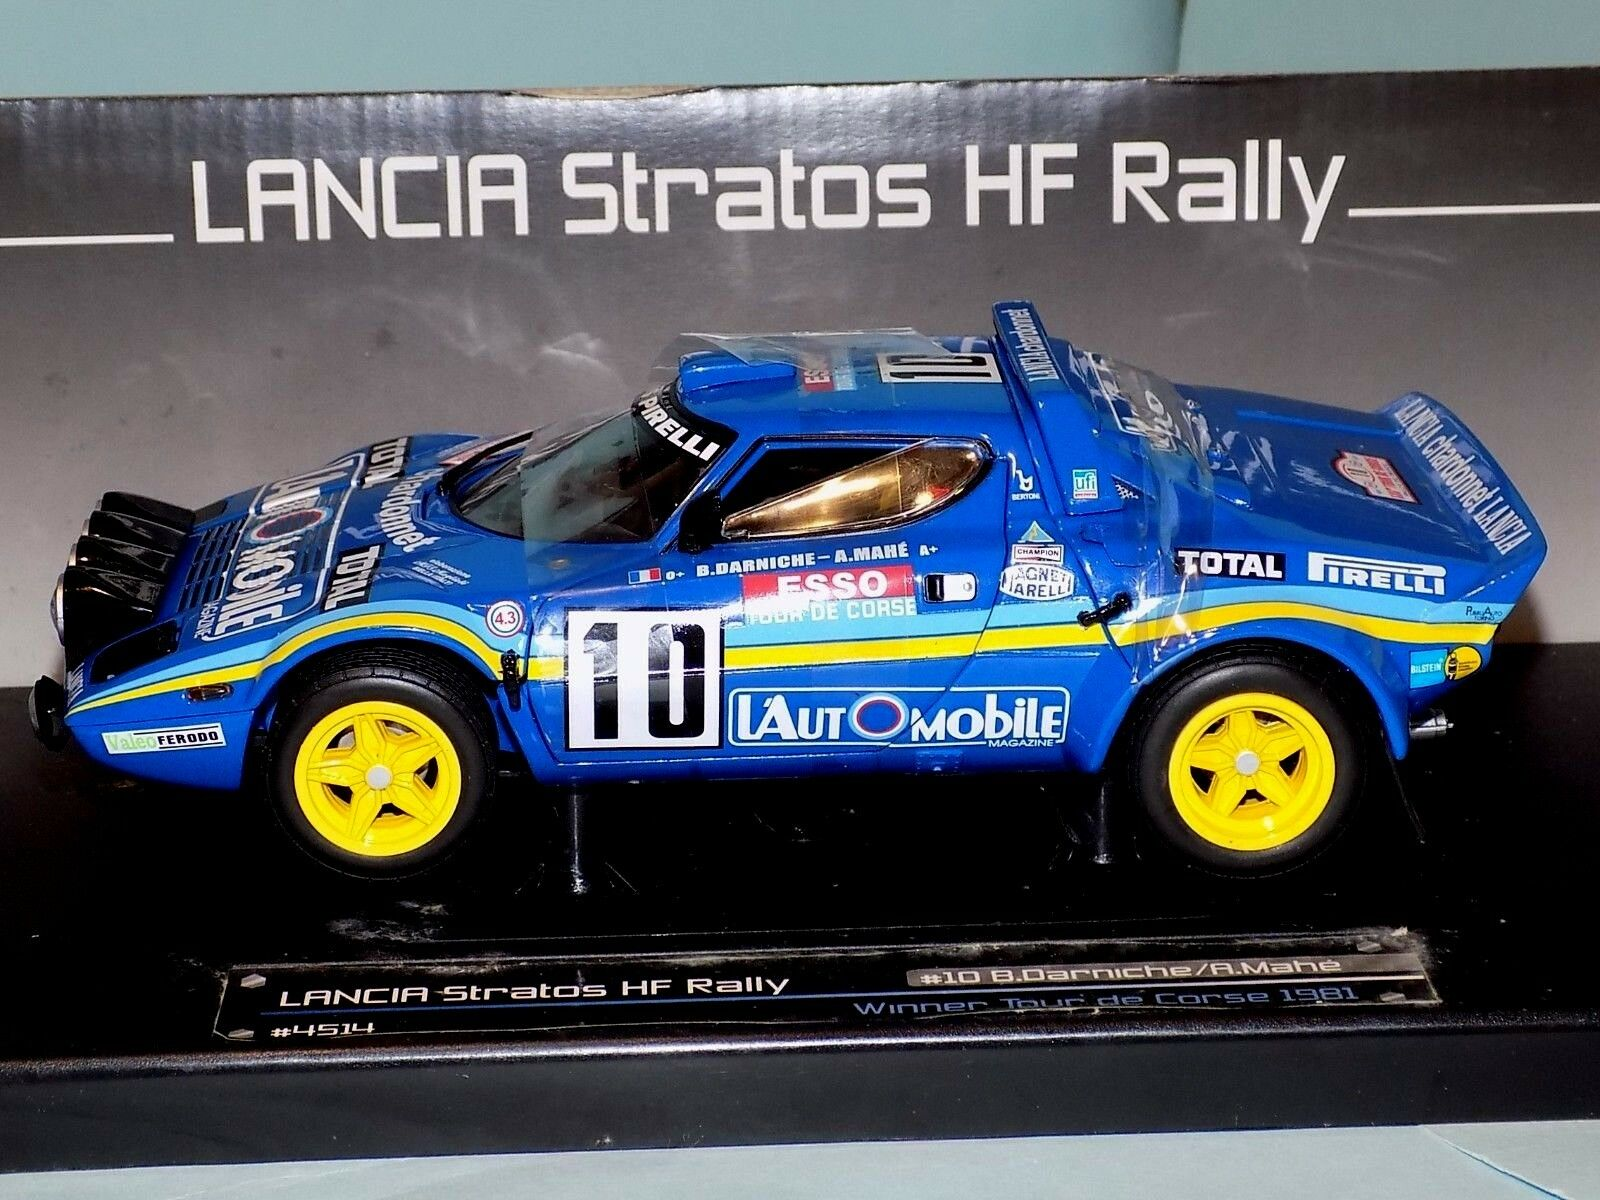 LANCIA STRATOS HF RALLYE B. DARNICHE  10 1981 1st Tour de Corse SUN STAR 4514 1 18